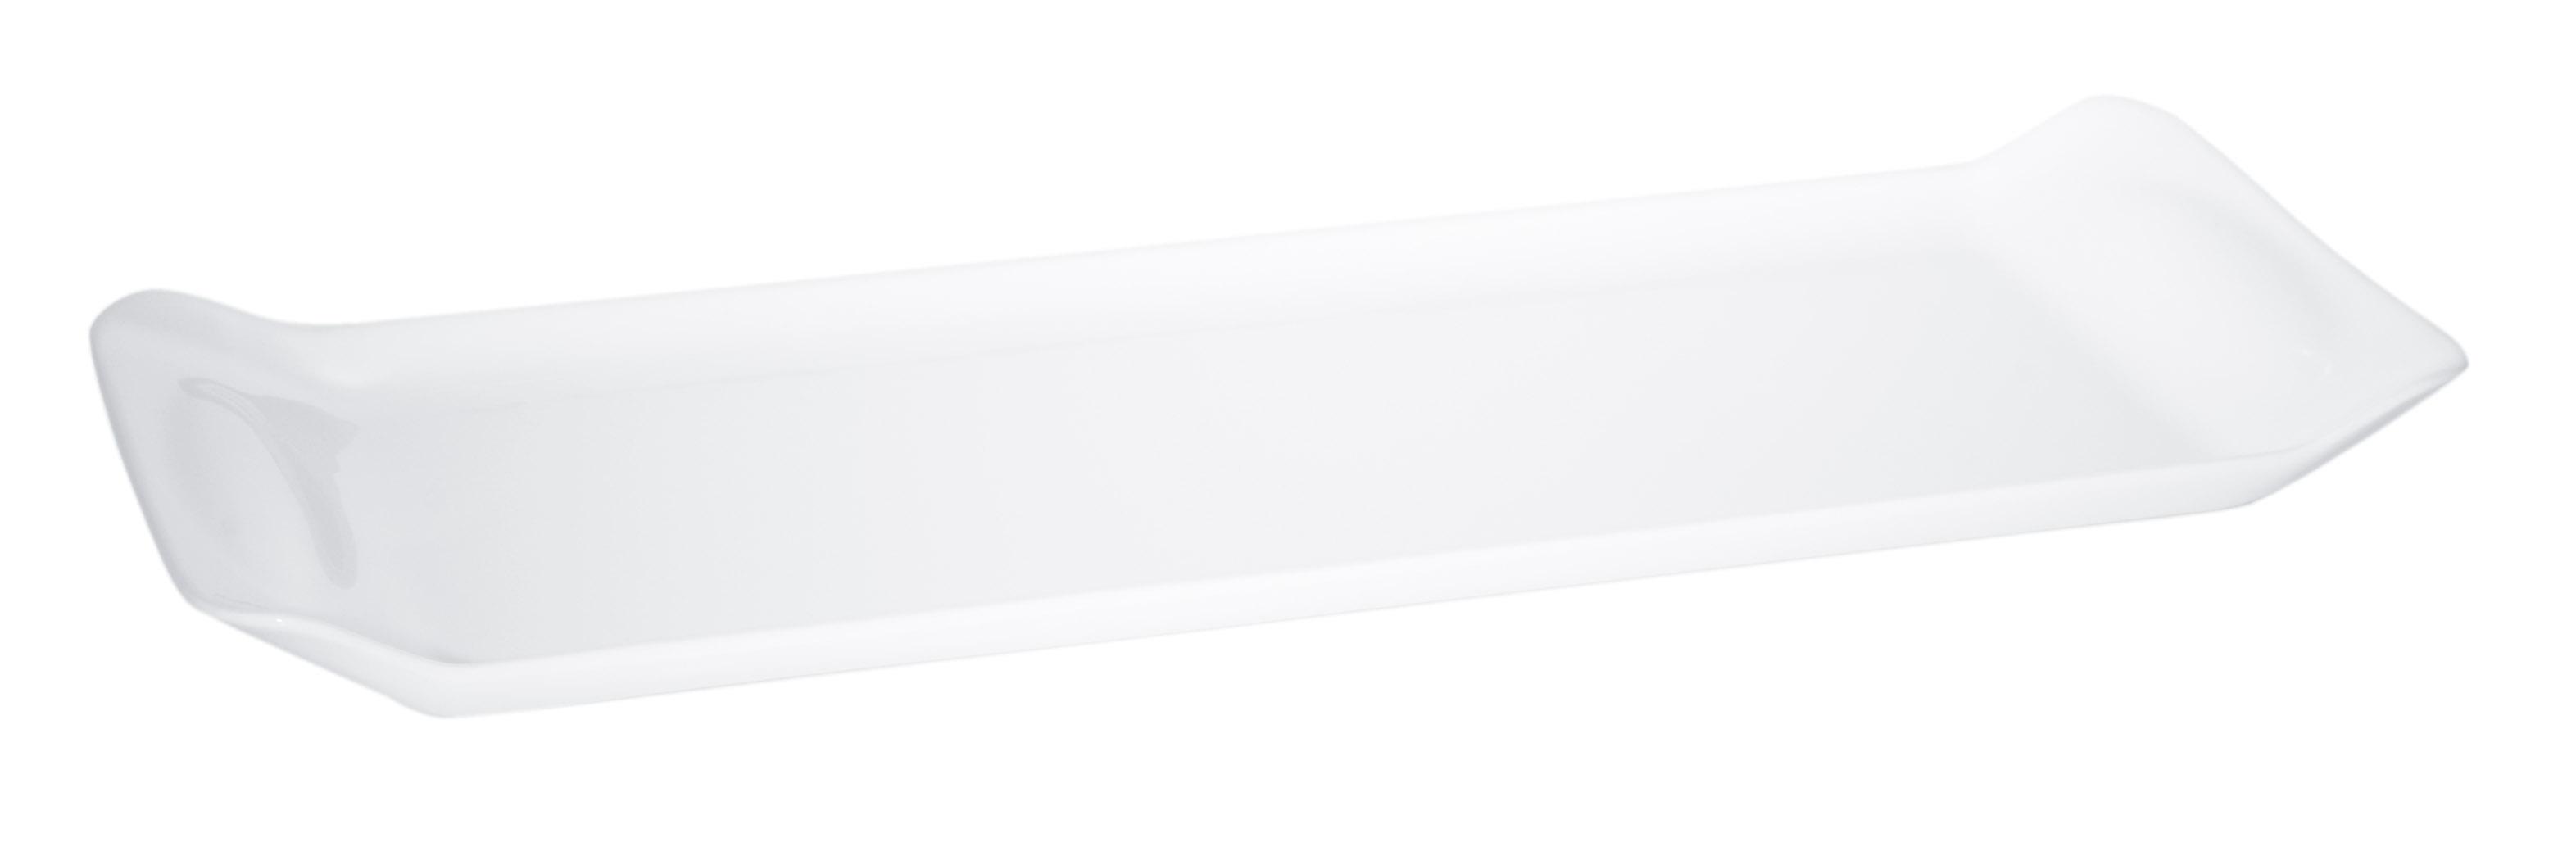 VASSOIO BUFFET WHITE - BUFFET TRAY WHITE - 55 x 20cm (1)